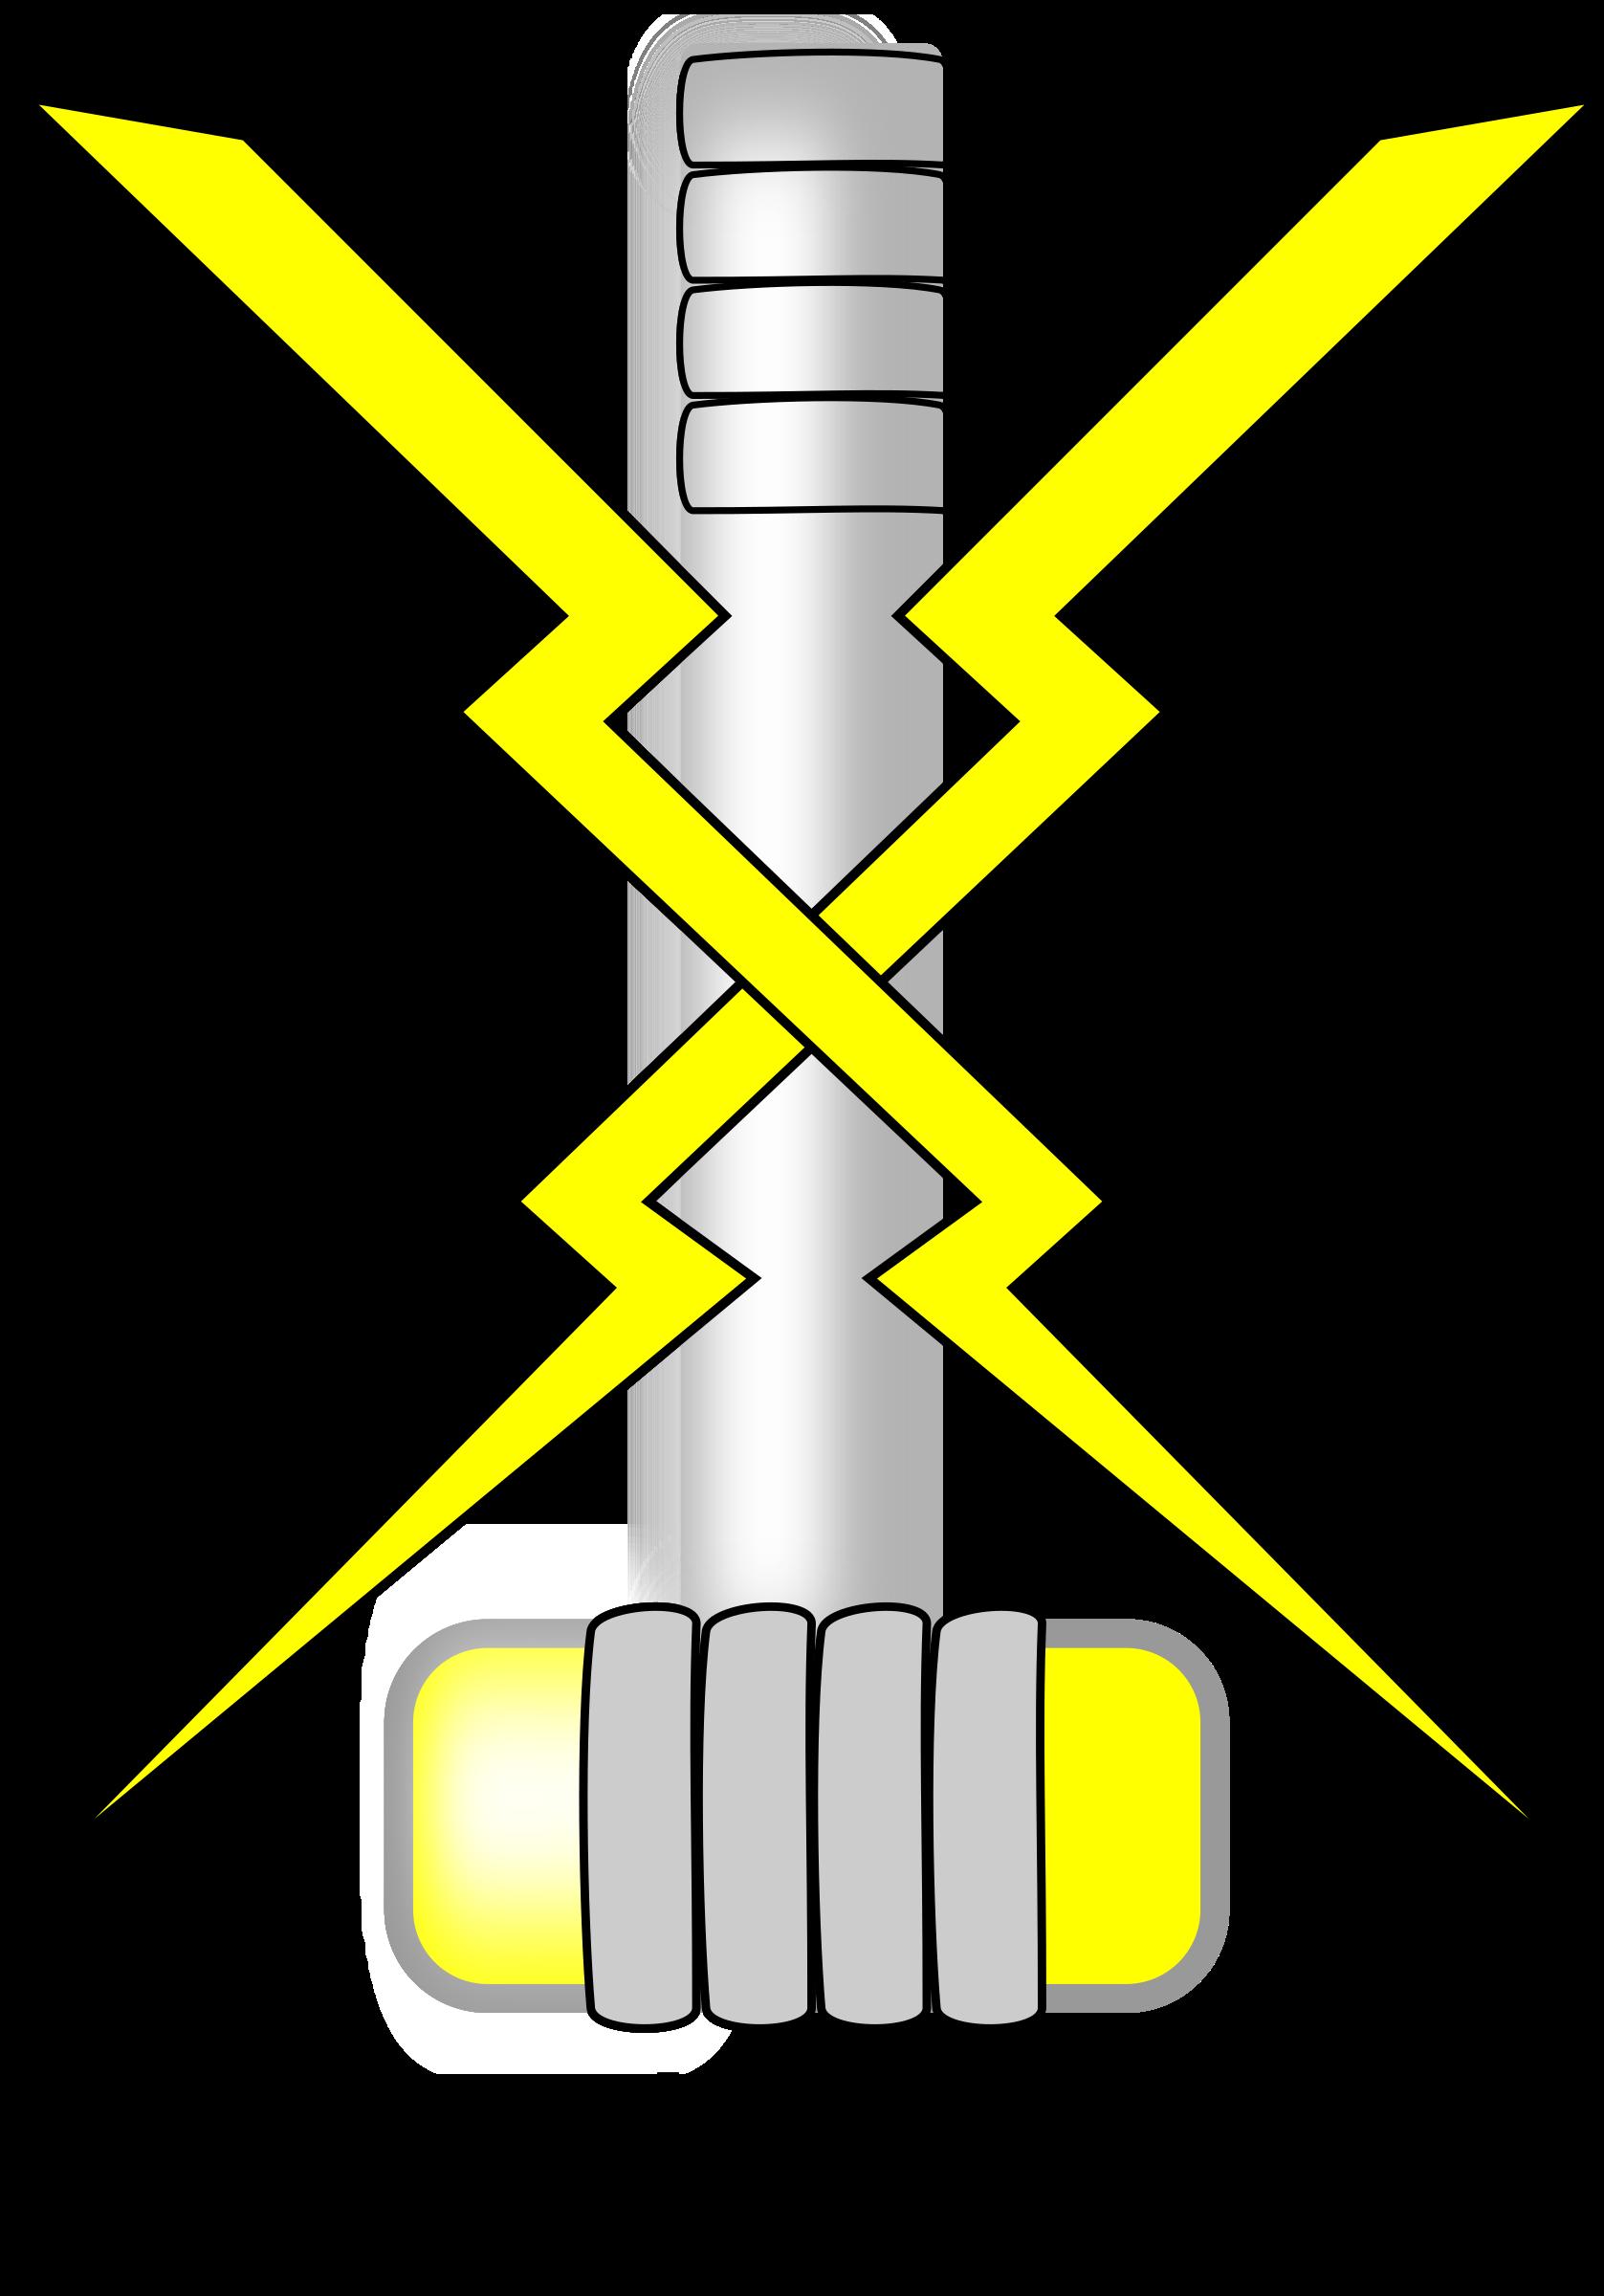 Thor cilpart bold design. Hammer clipart admin